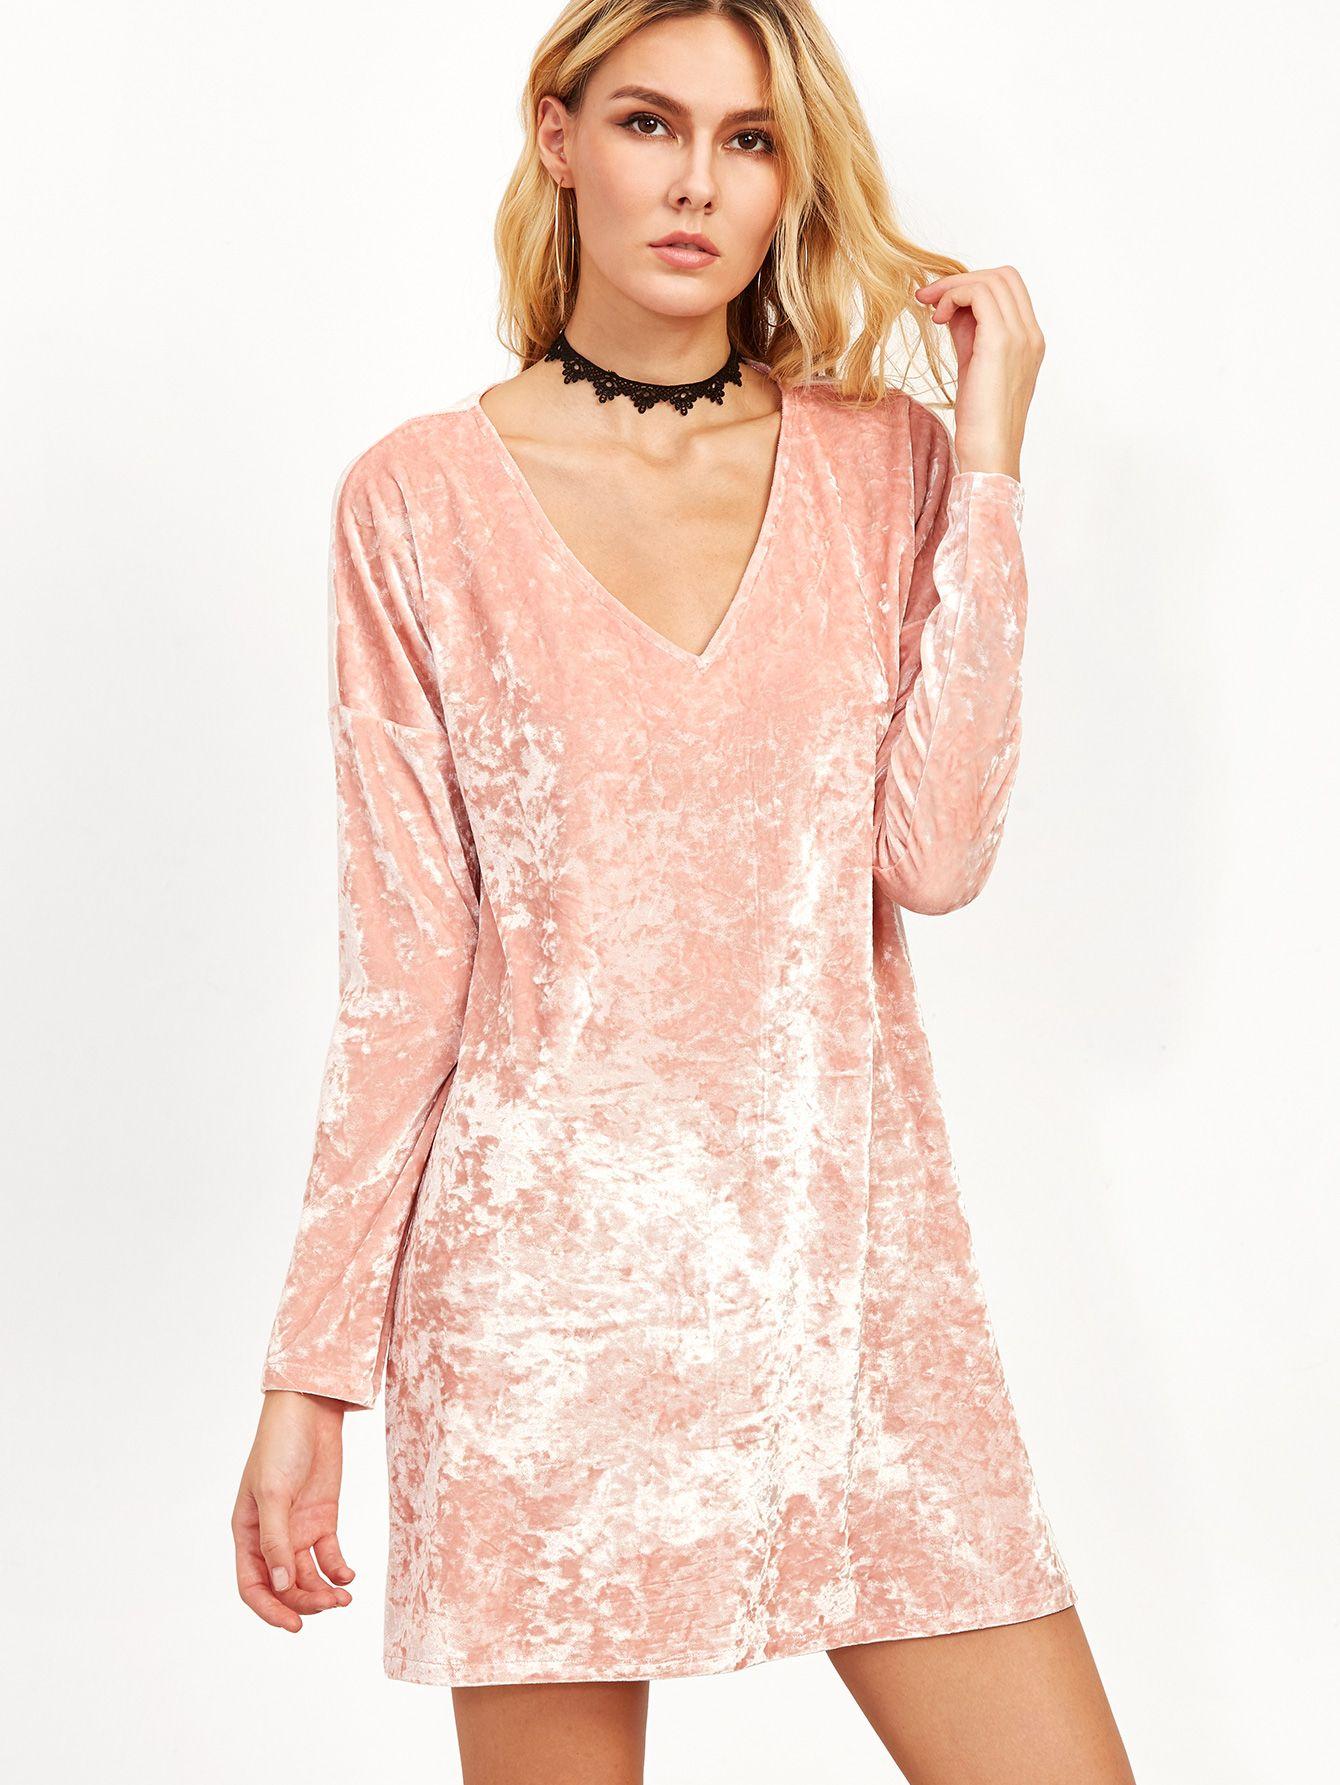 94eb9d07d1 Shop Pink Velvet V Neck Shift Dress online. SheIn offers Pink Velvet V Neck  Shift Dress & more to fit your fashionable needs.